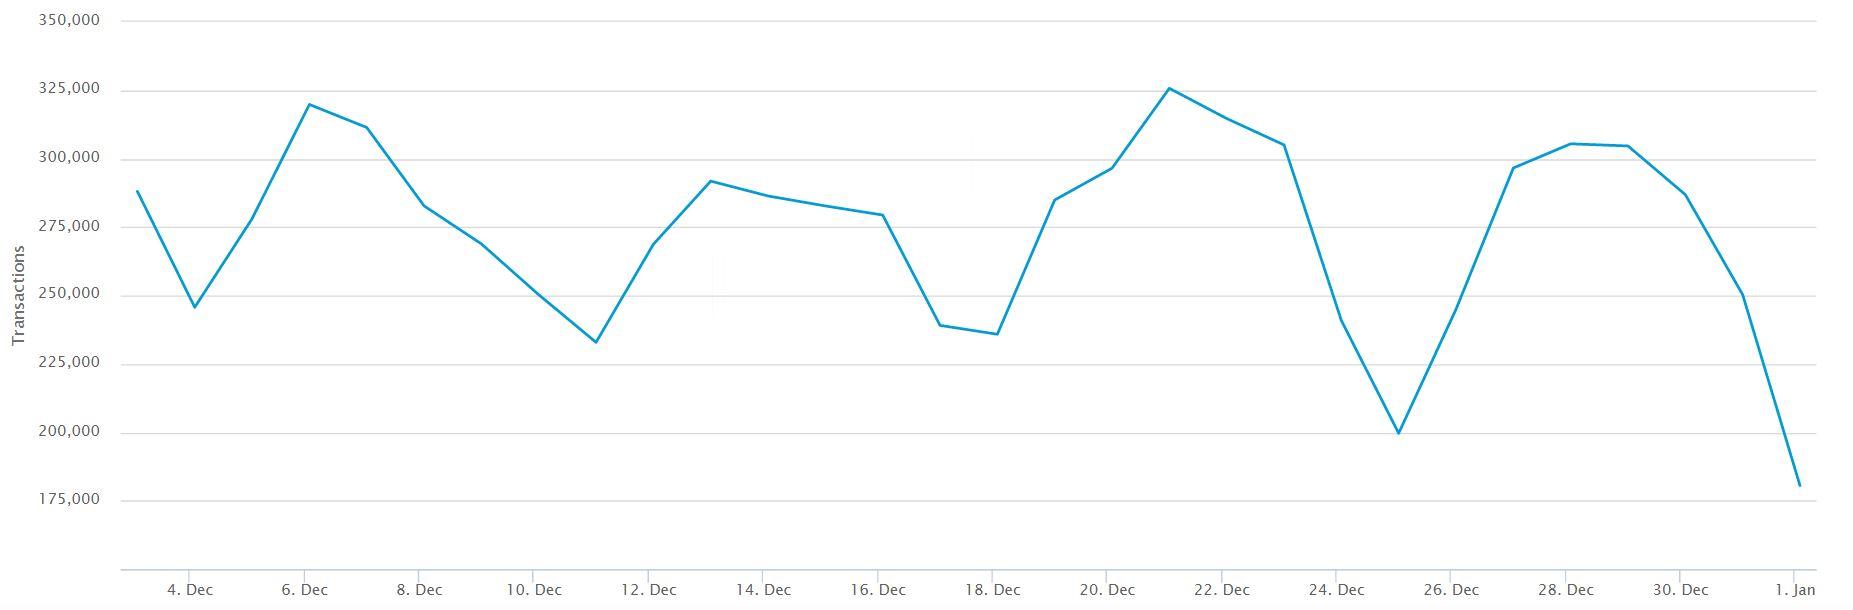 30 Day Bitcoin Transaction Volume Chart